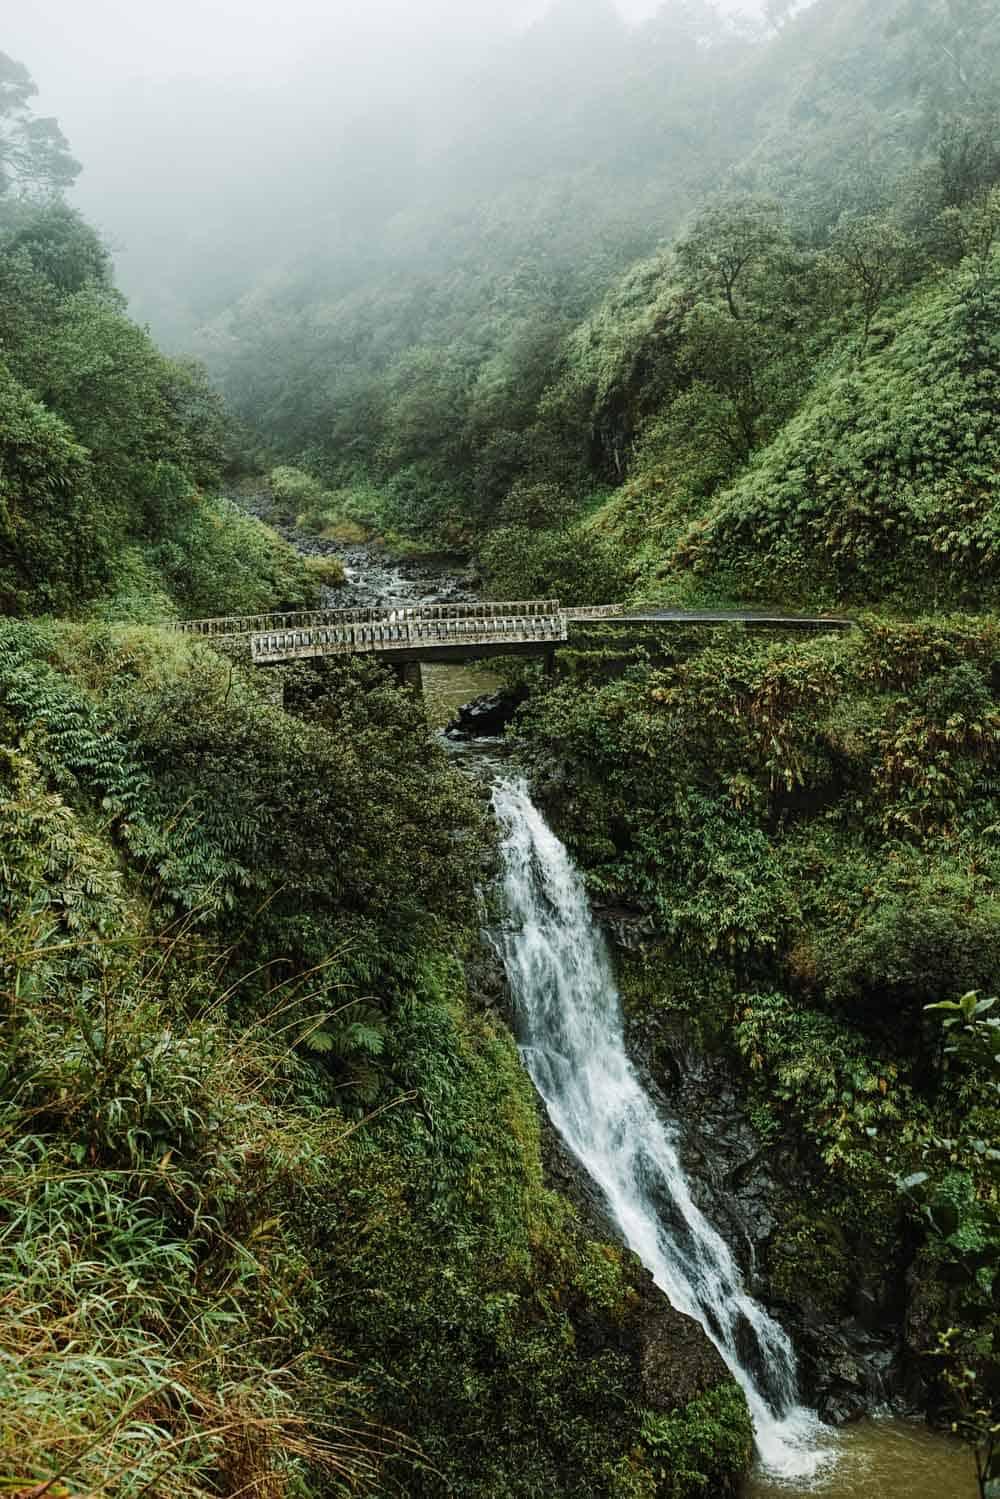 Makapipi Falls in Hawaii